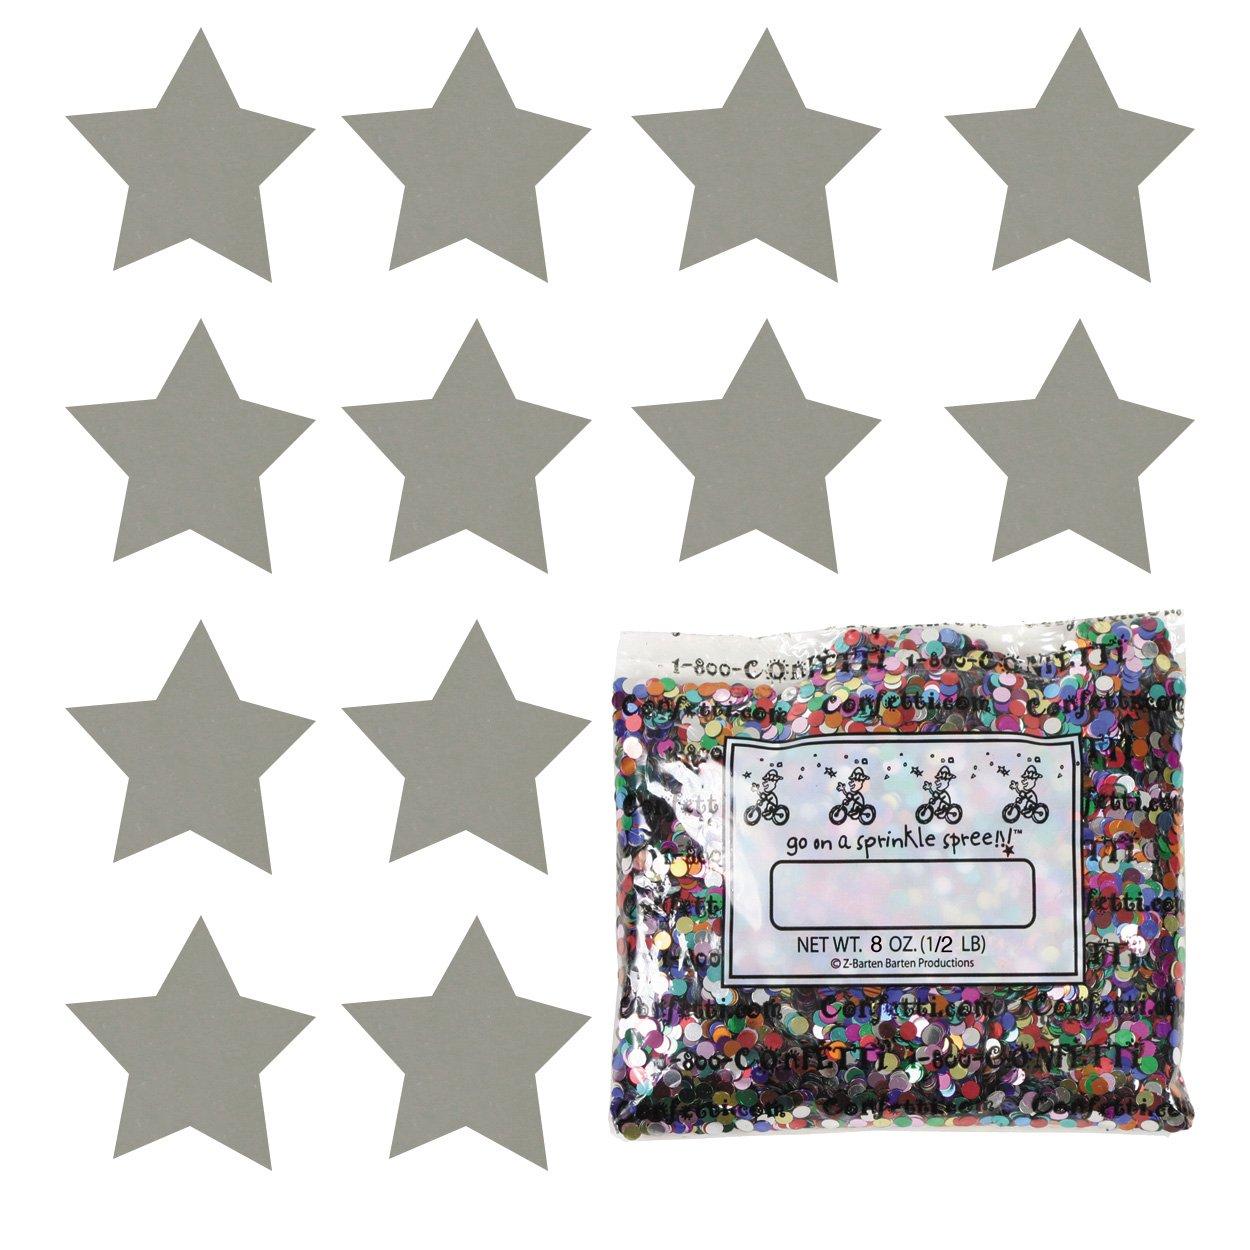 Confetti Star 3/4'' Silver - Half Pound (8 oz) Free Ship (8574) by Jimmy Jems